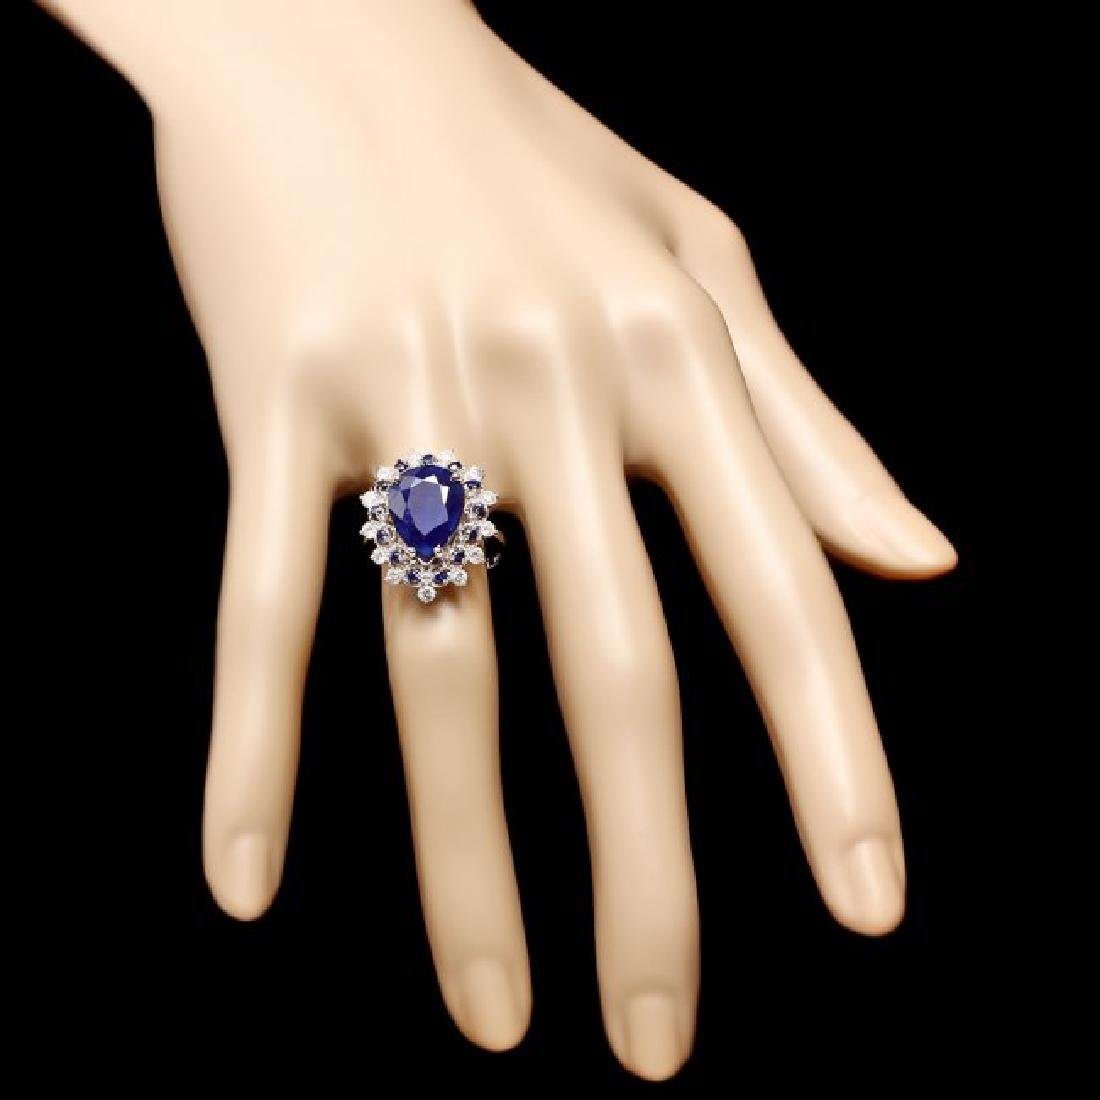 14k Gold 5.55ct Sapphire 0.55ct Diamond Ring - 4